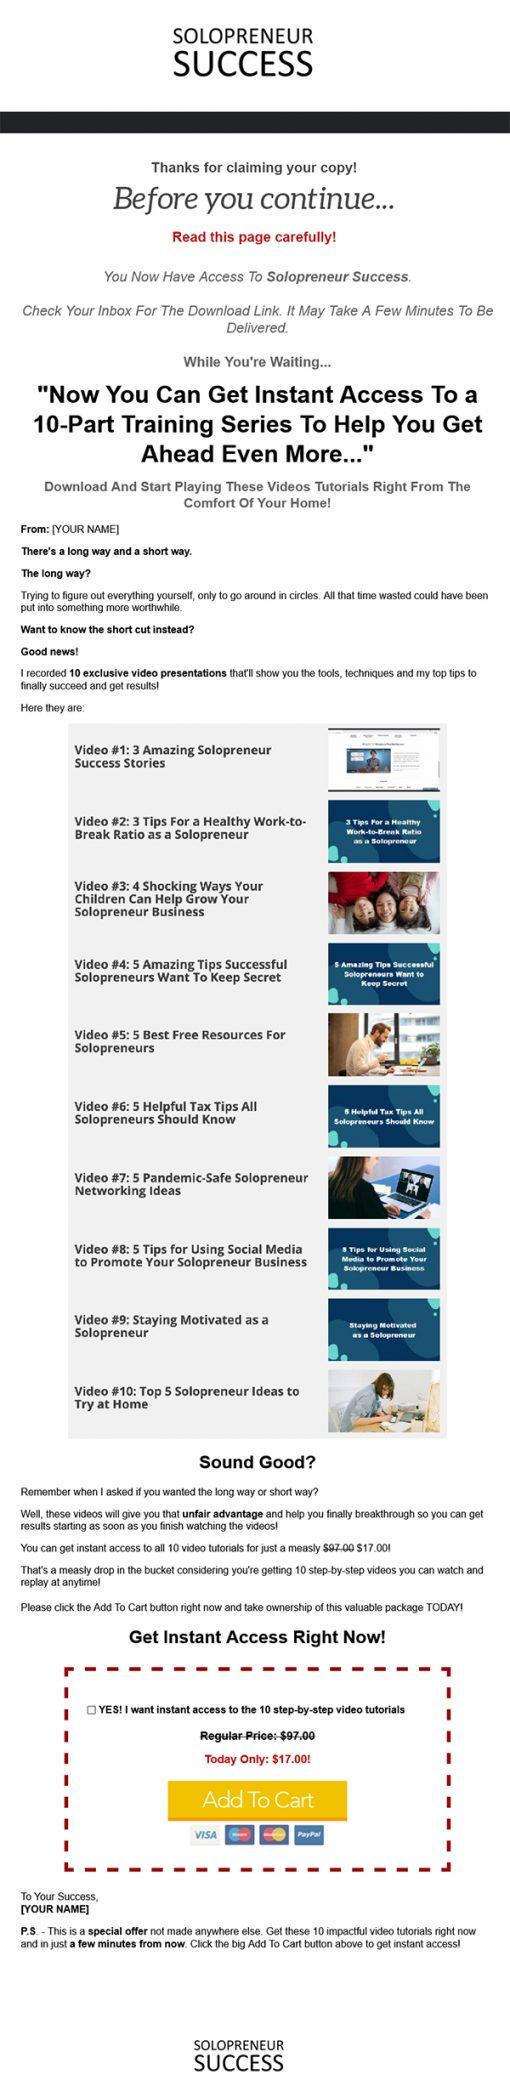 Solopreneur Success Ebook and Videos MRR